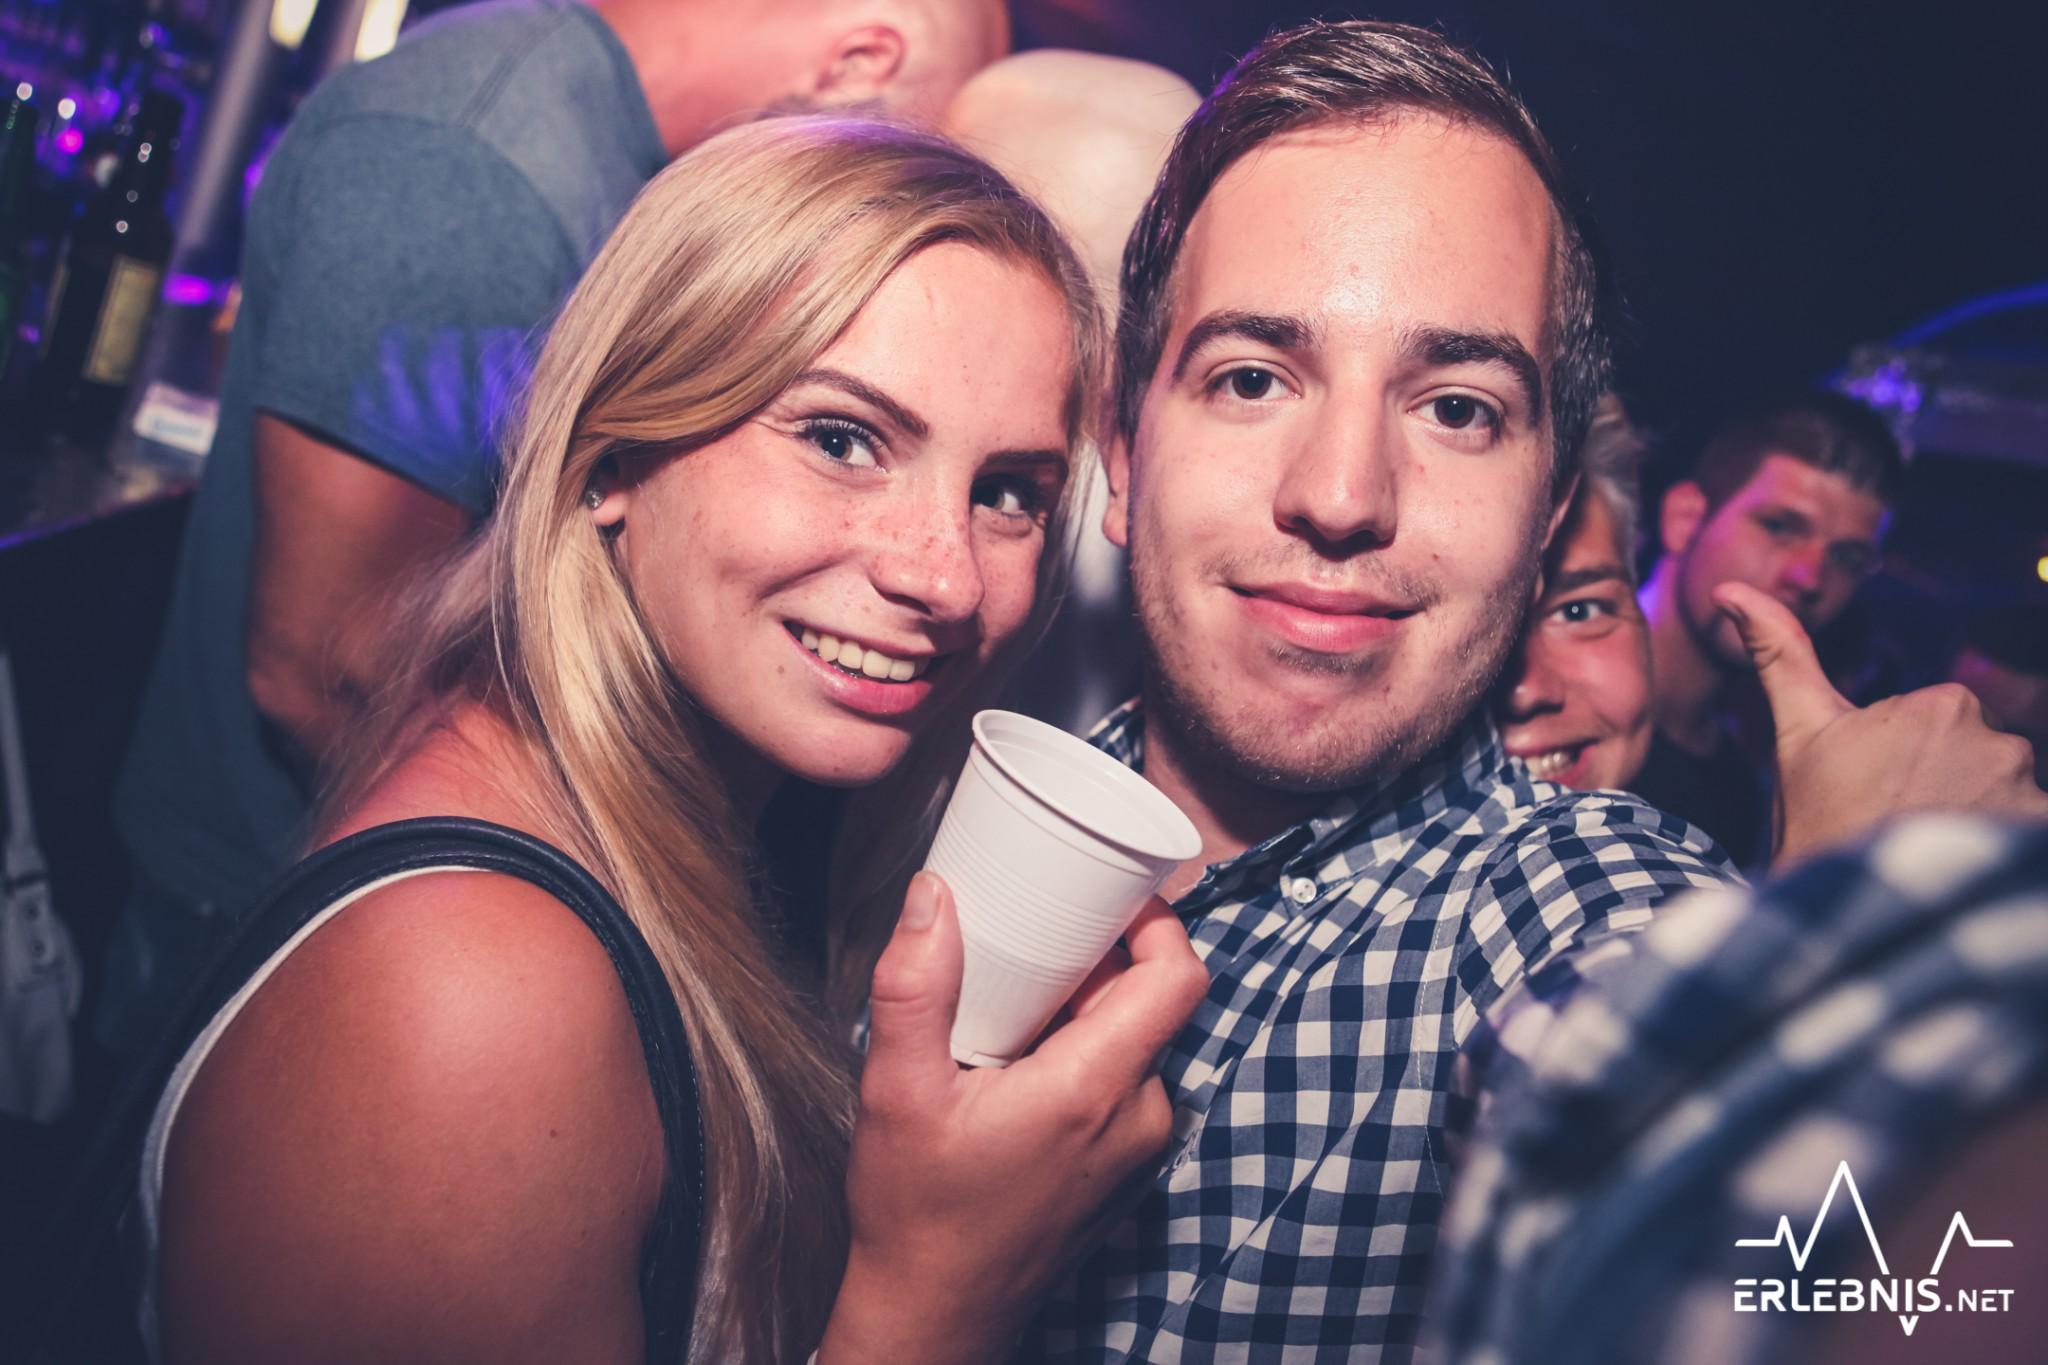 Gay dating Klagenfurt